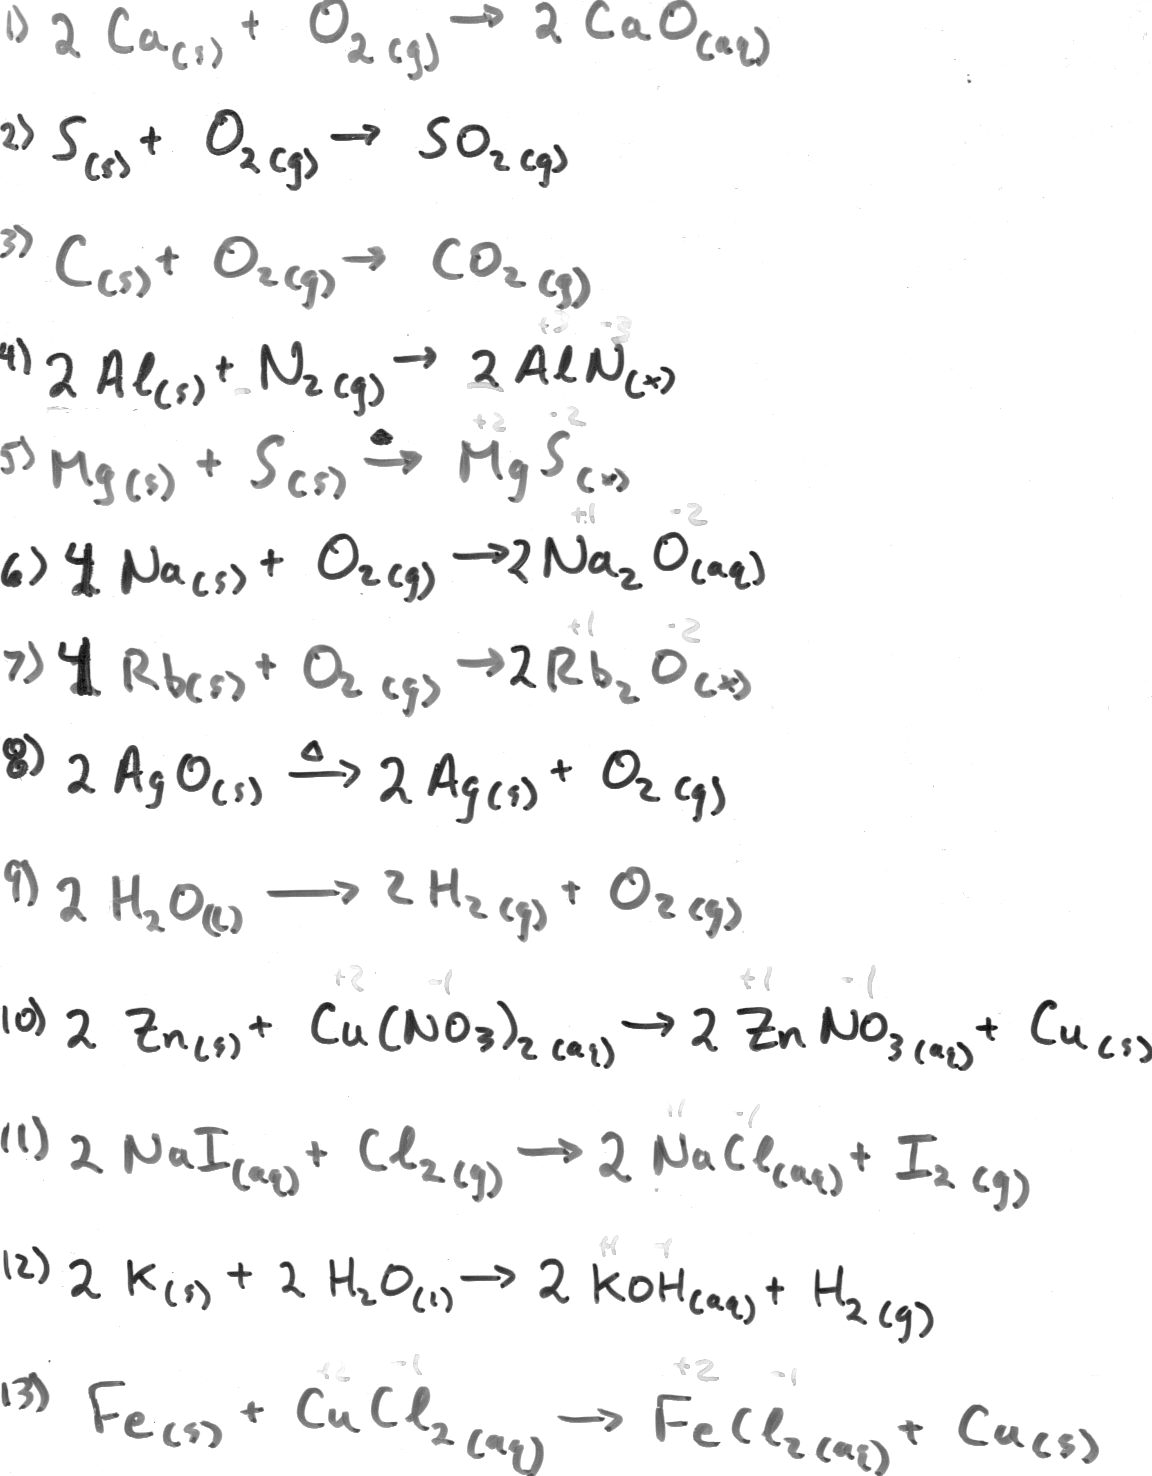 Chemistry Worksheet Balancing Equations Part 2 The Best Worksheets